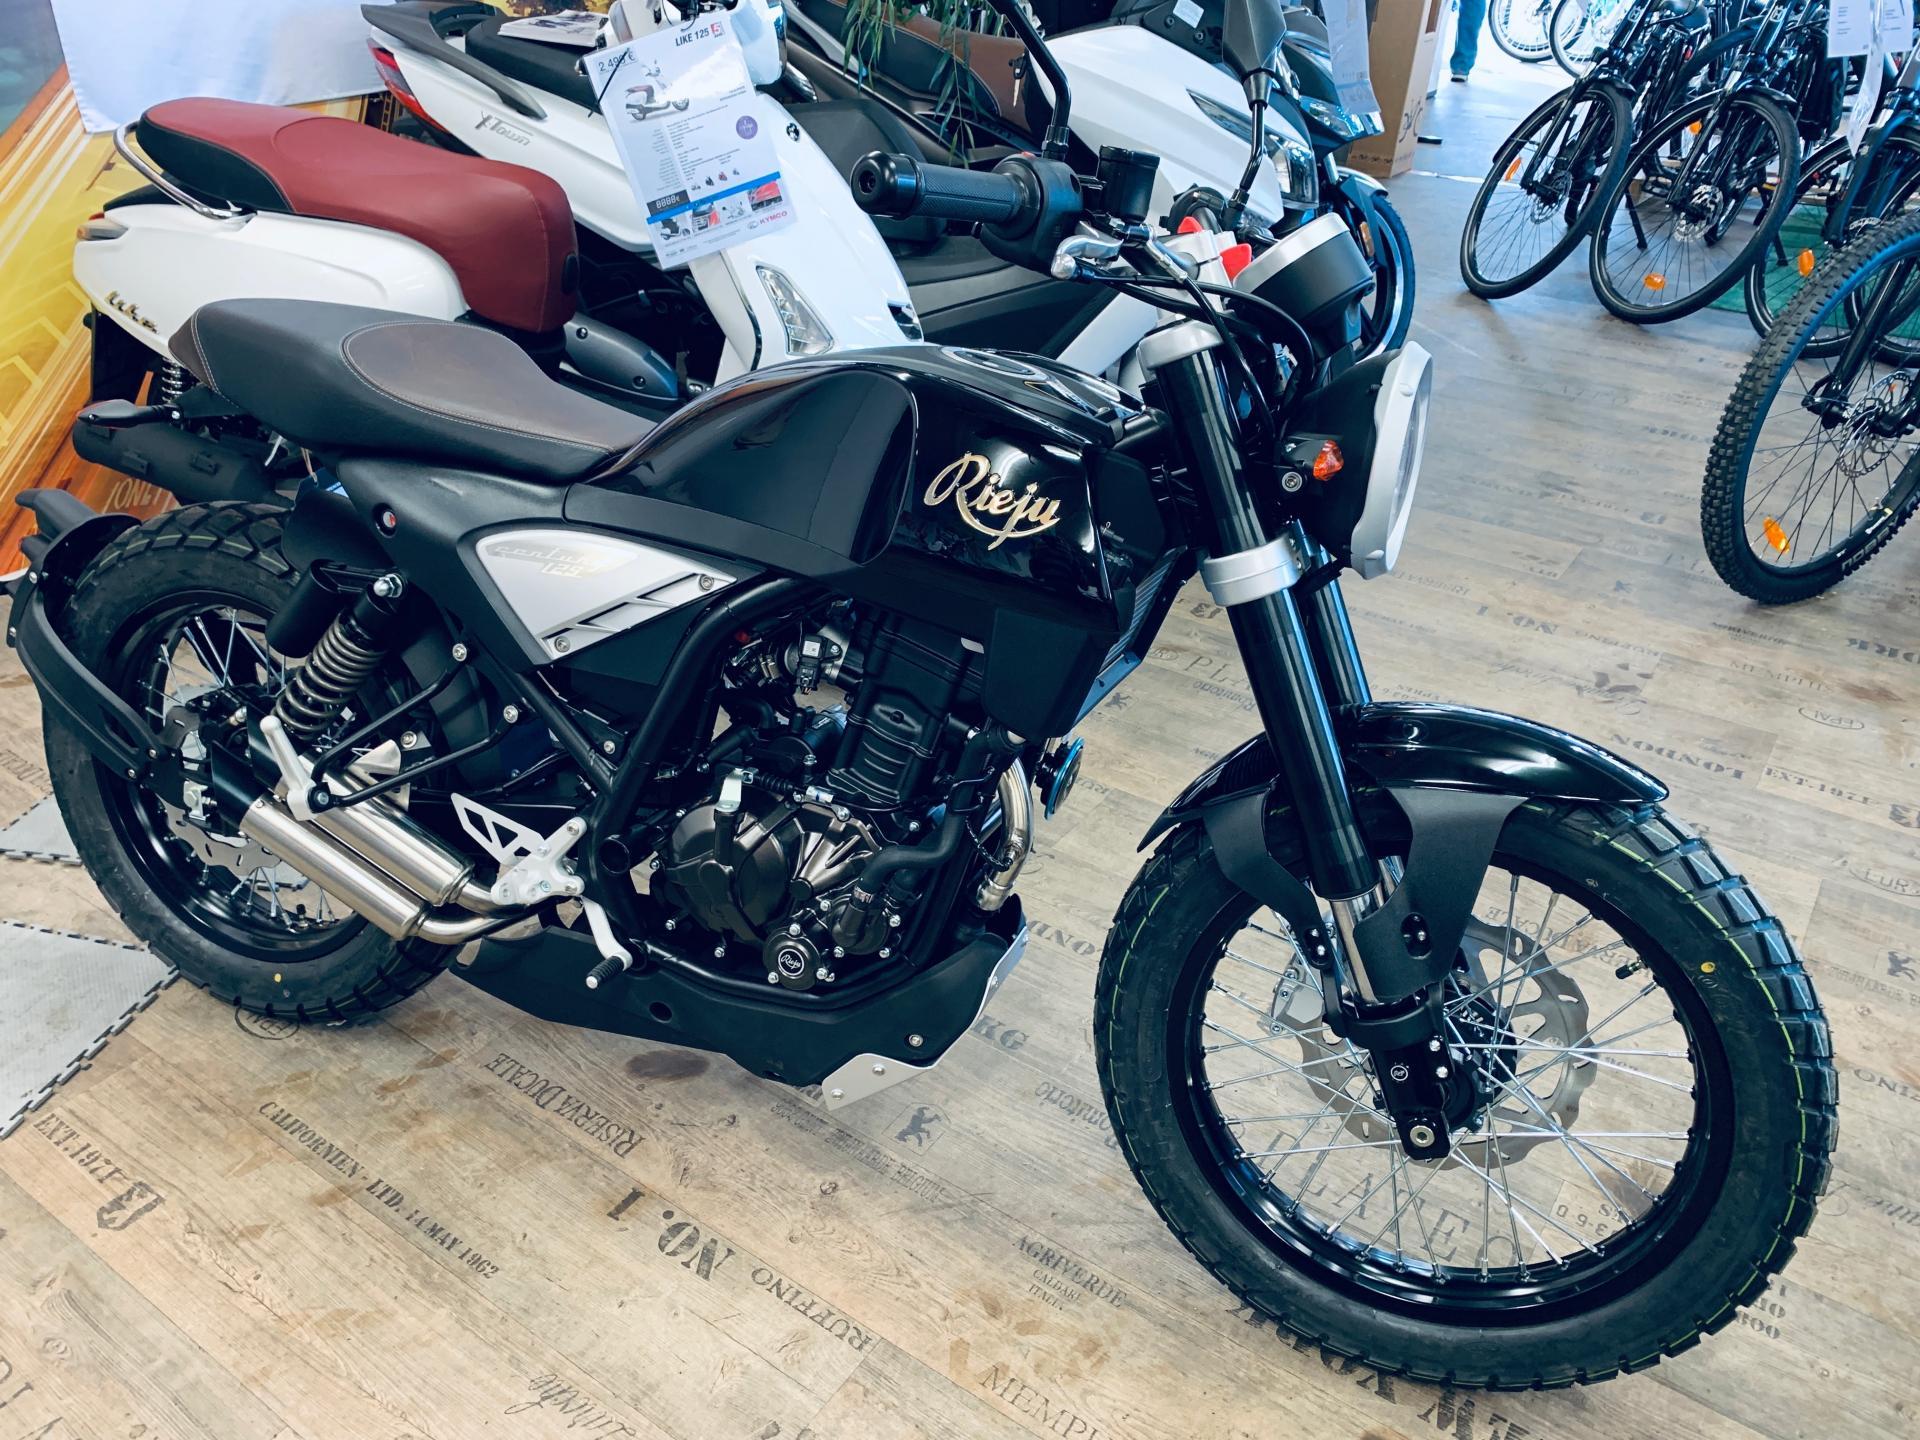 Moto, Rieju, Century 125 Euro 5